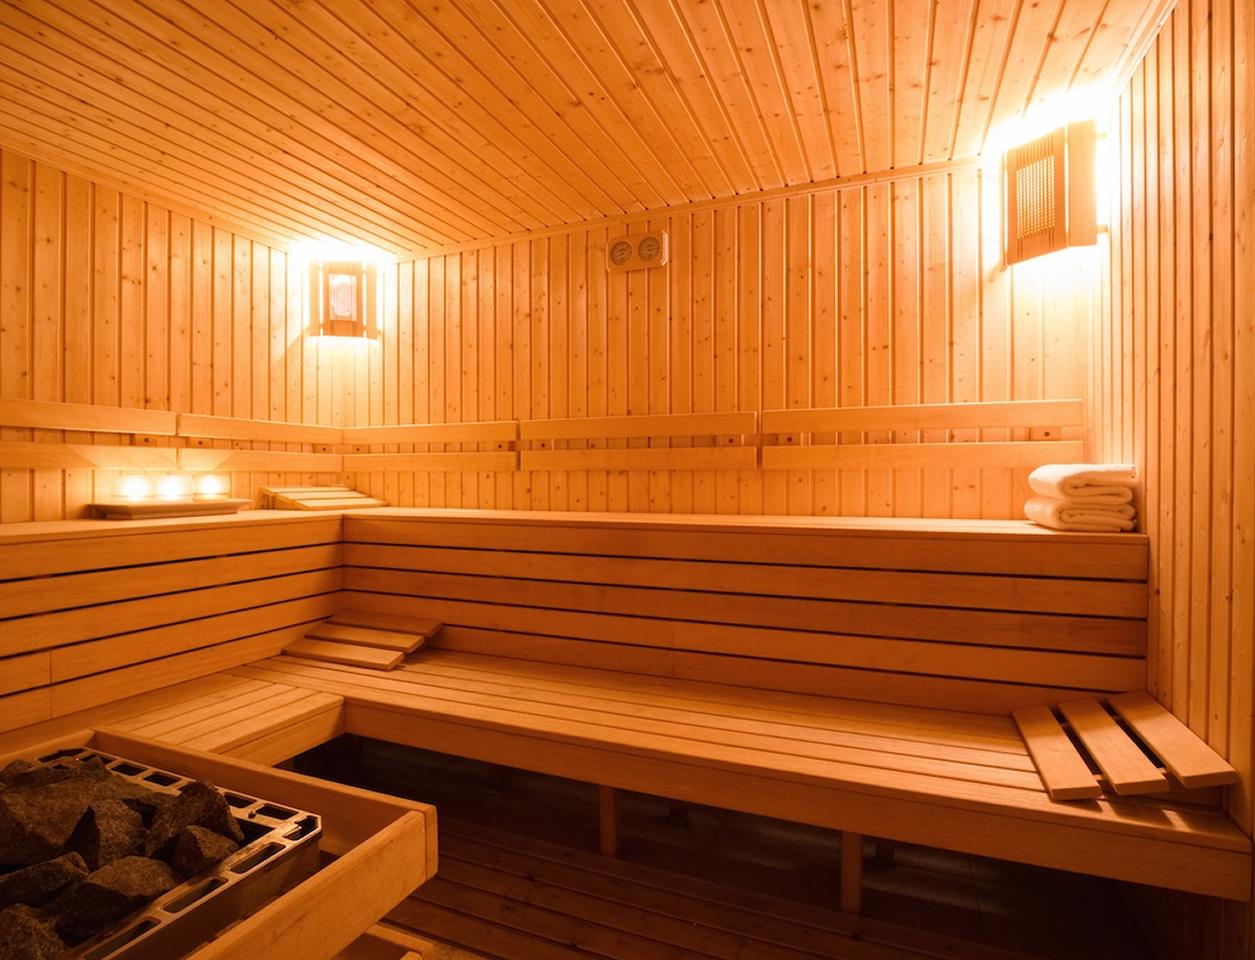 Sauna op maat laten maken Klemskerke